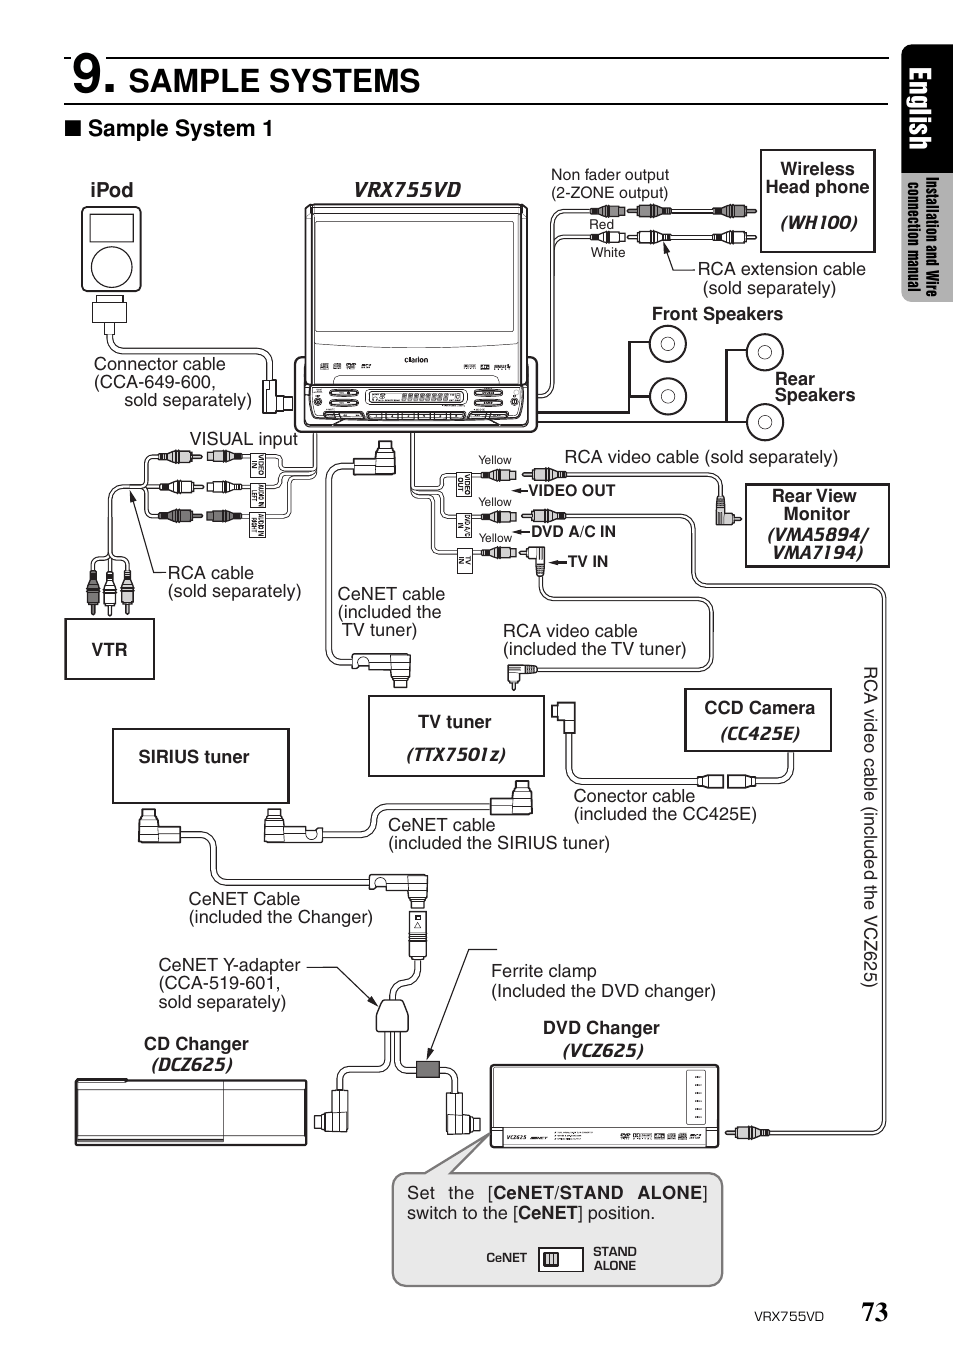 Clarion Xmd3 Wiring Diagram Diagrams Schematics Flowchart Software Visio Complete Circuit On Marine Radio Manuals Cmd5 For Excellent Aux